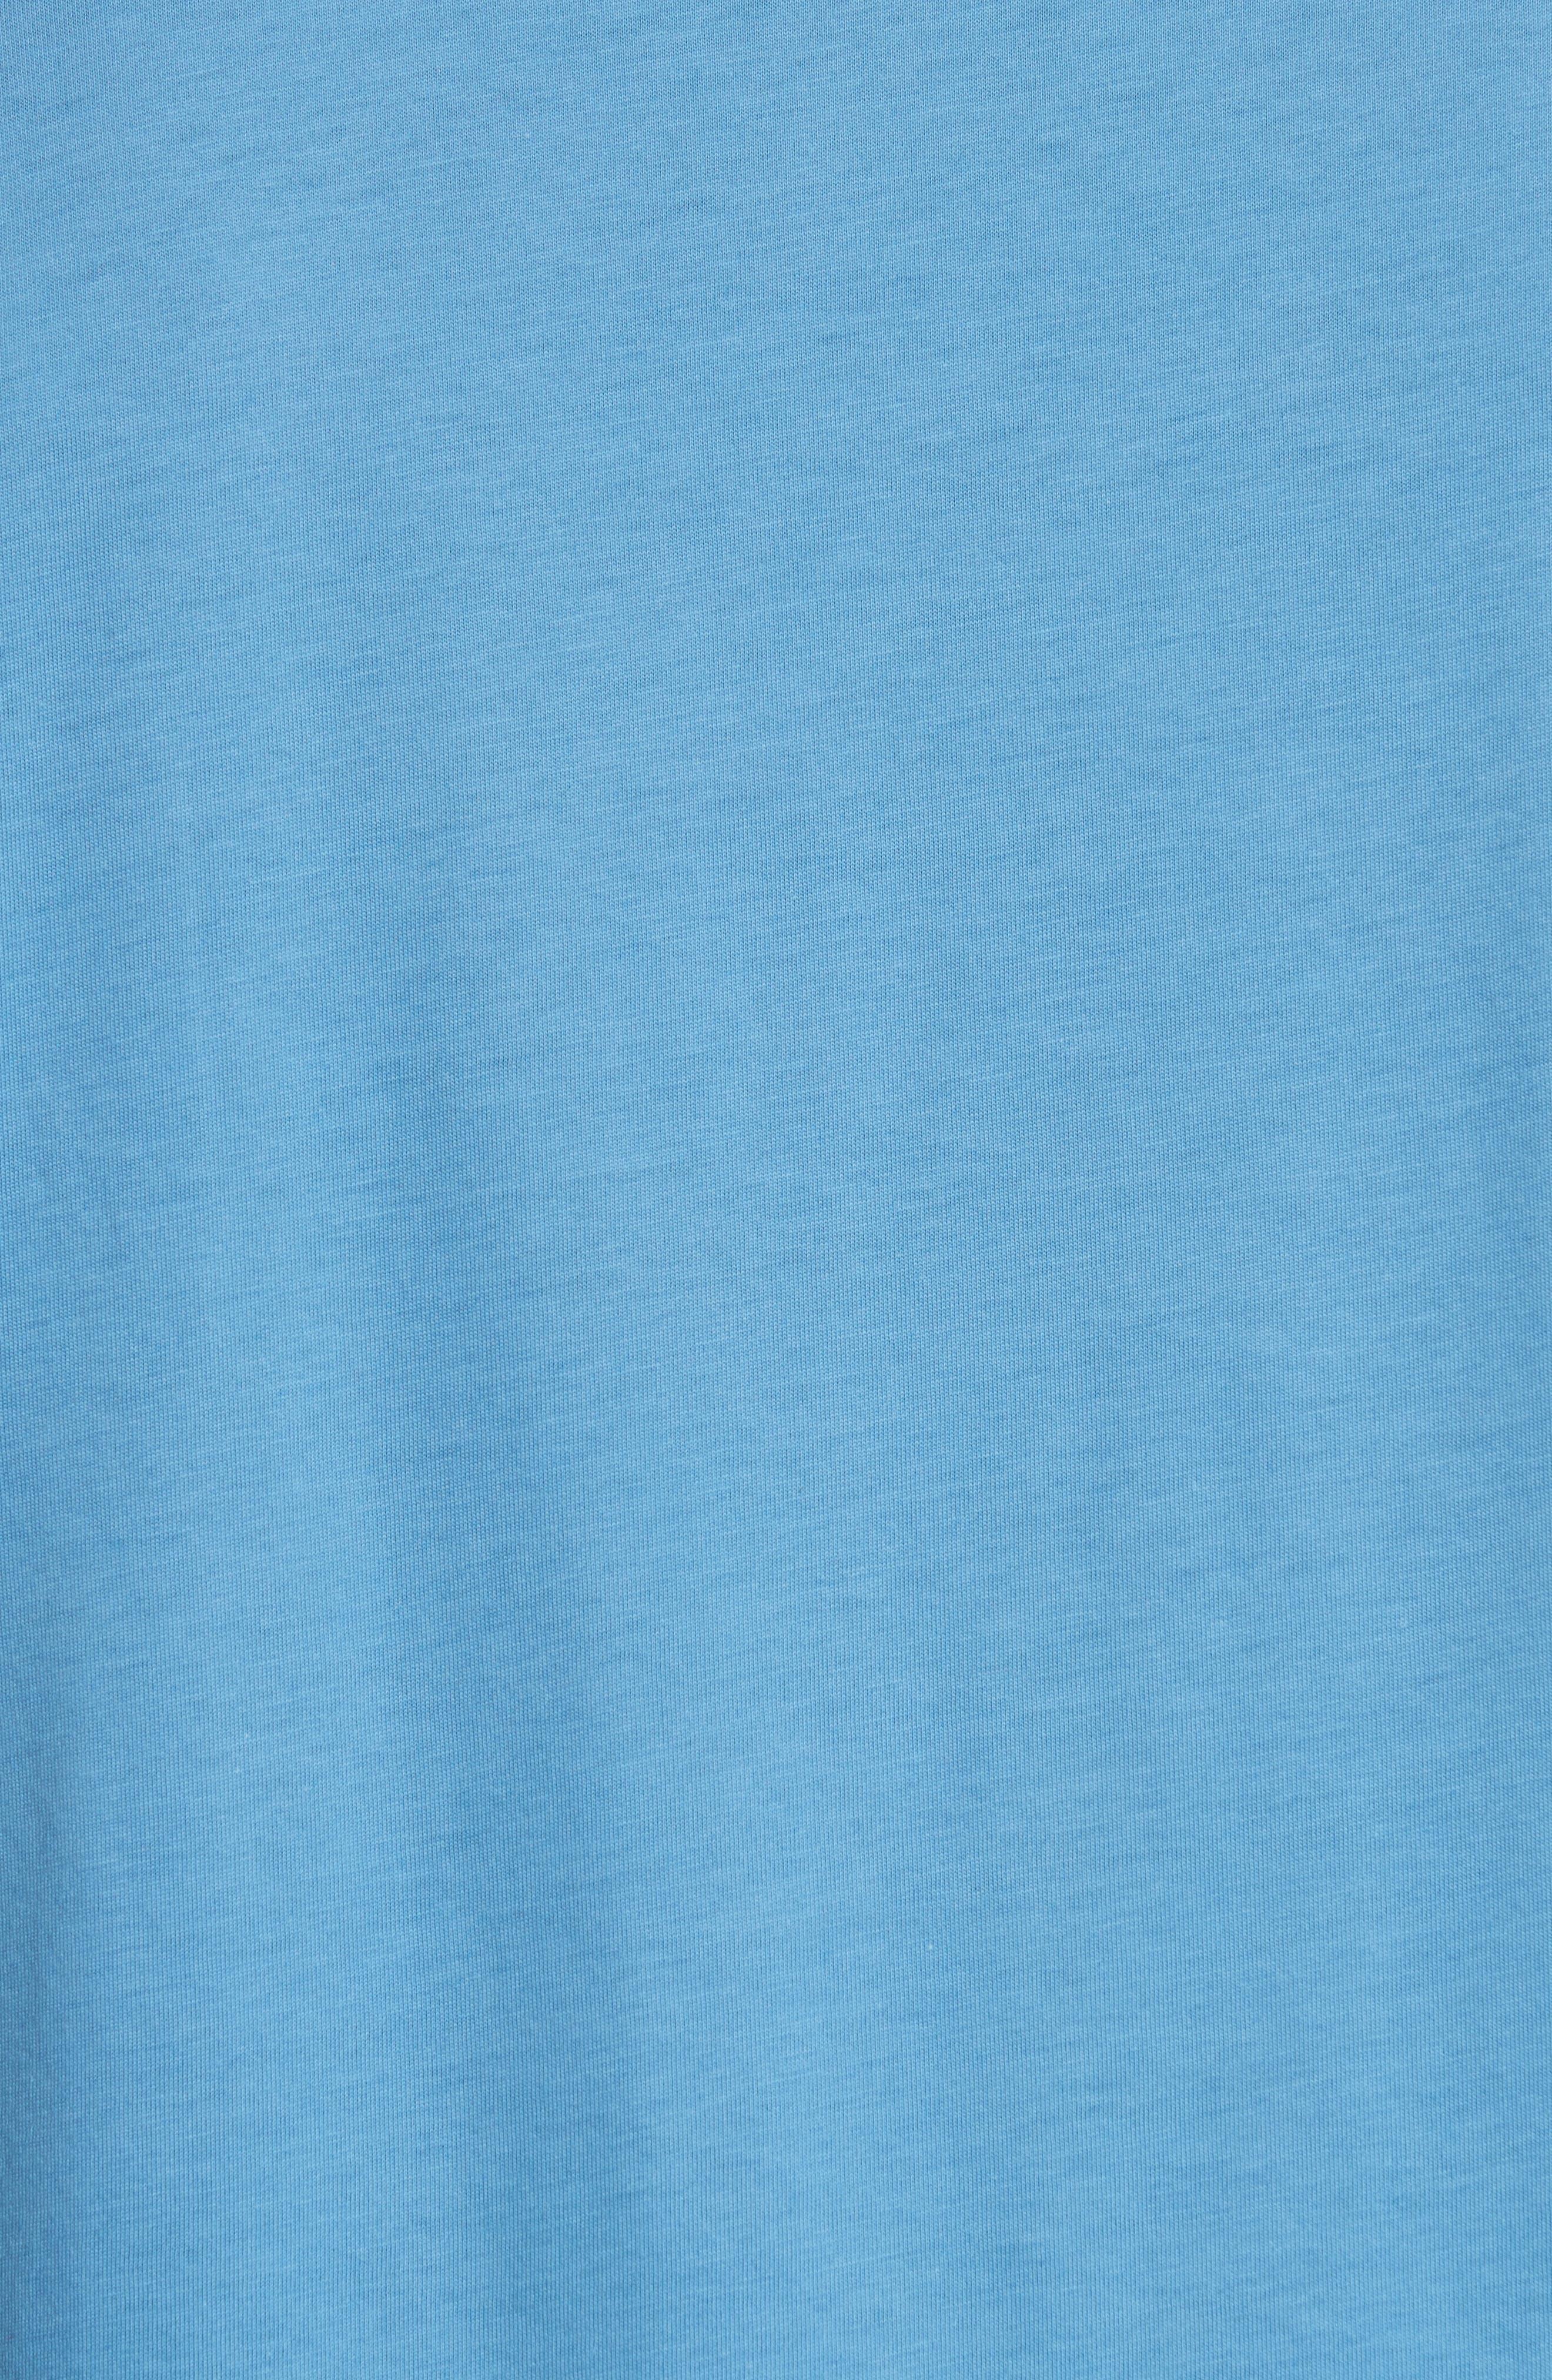 BURBERRY,                             Jadford Standard Fit V-Neck Tee,                             Alternate thumbnail 5, color,                             400